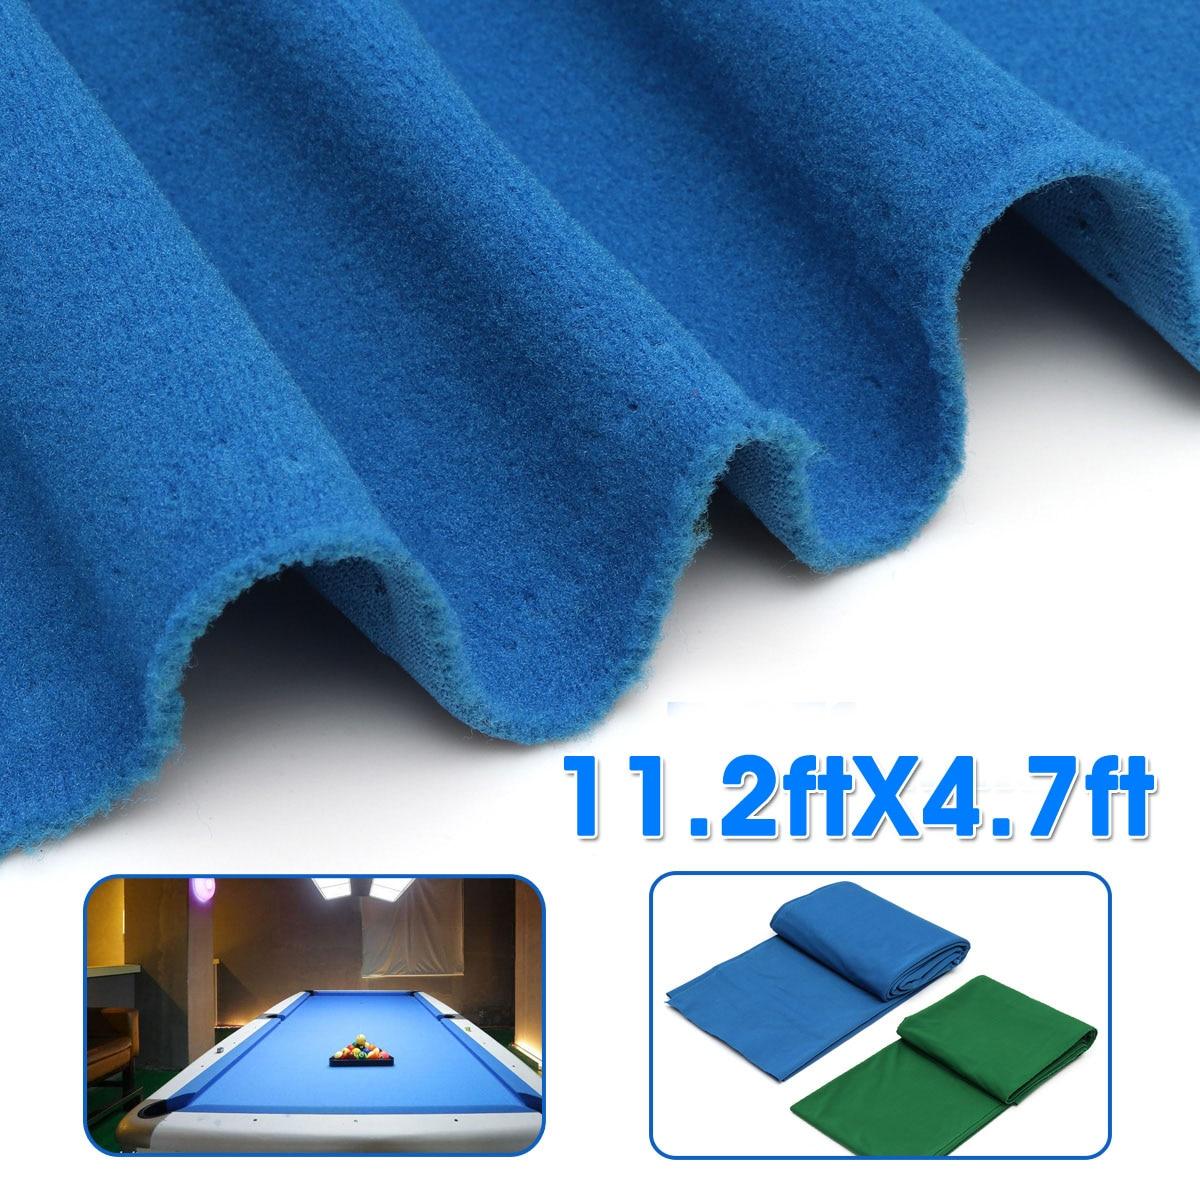 Green/Blue Snooker Billiard Cloth Pool Eight Ball Billiard Pool Table Cloth For American Billiard Snooker Accessories 11.2X4.7ft